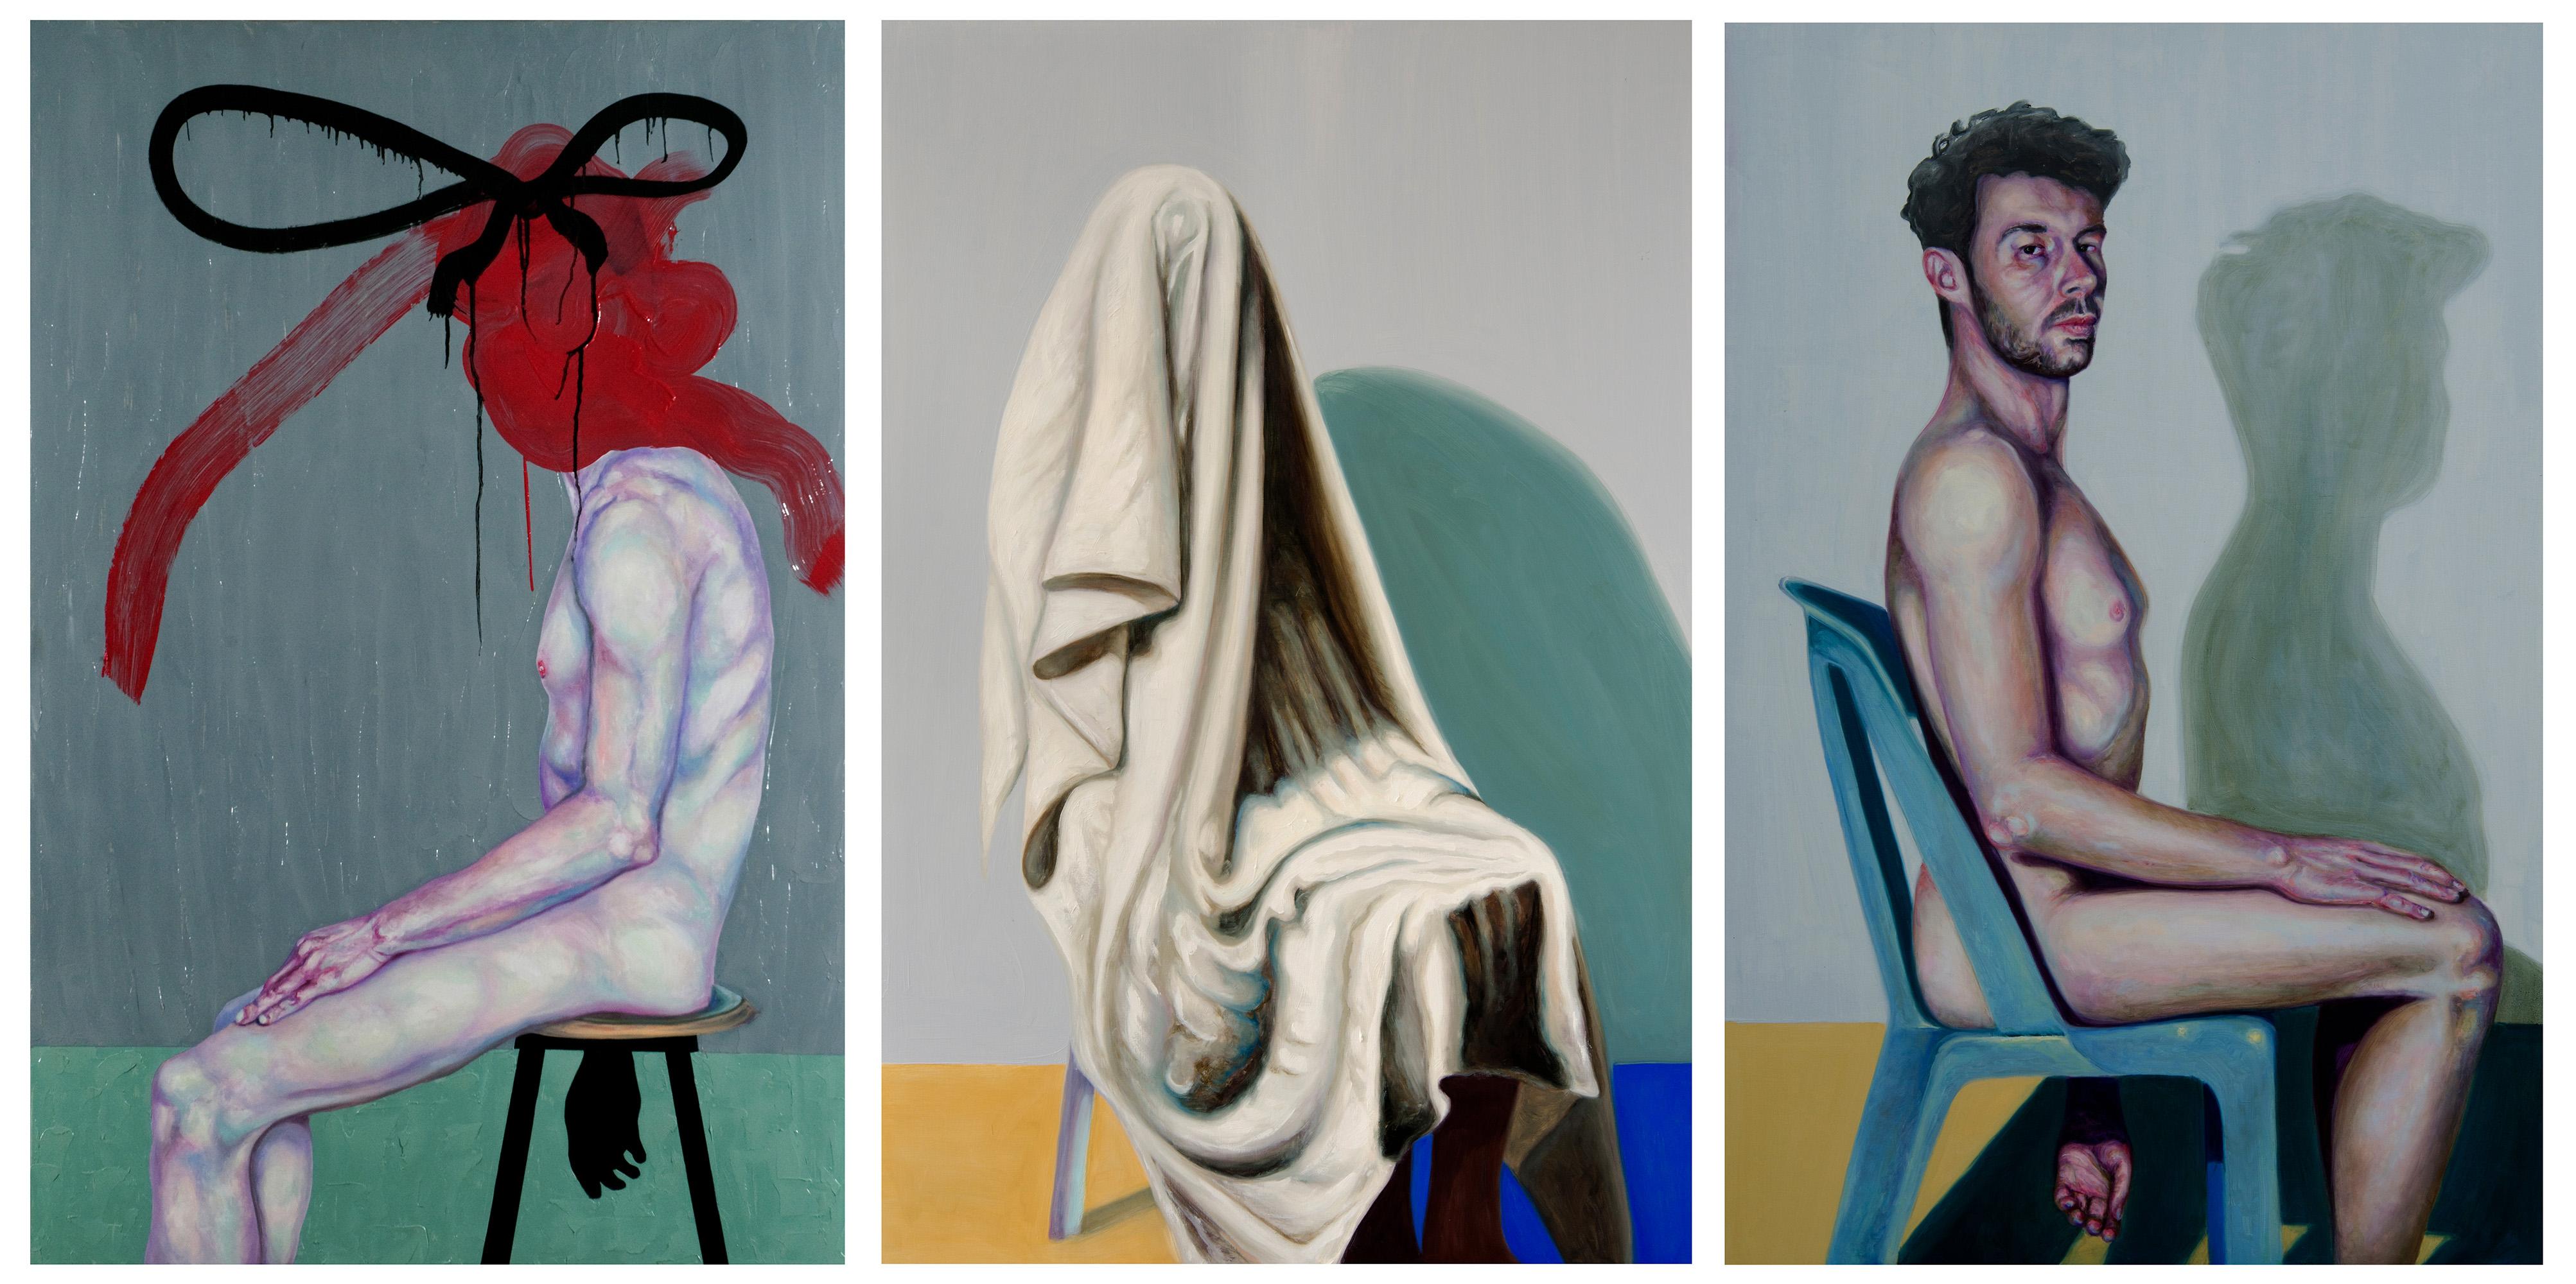 Self portrait, oil on wood, 122x80 cm (each painting), 2011-2014 © Stas Korolov